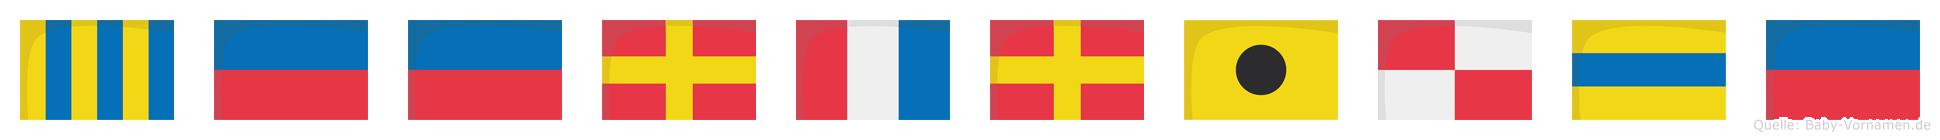 Geertriude im Flaggenalphabet